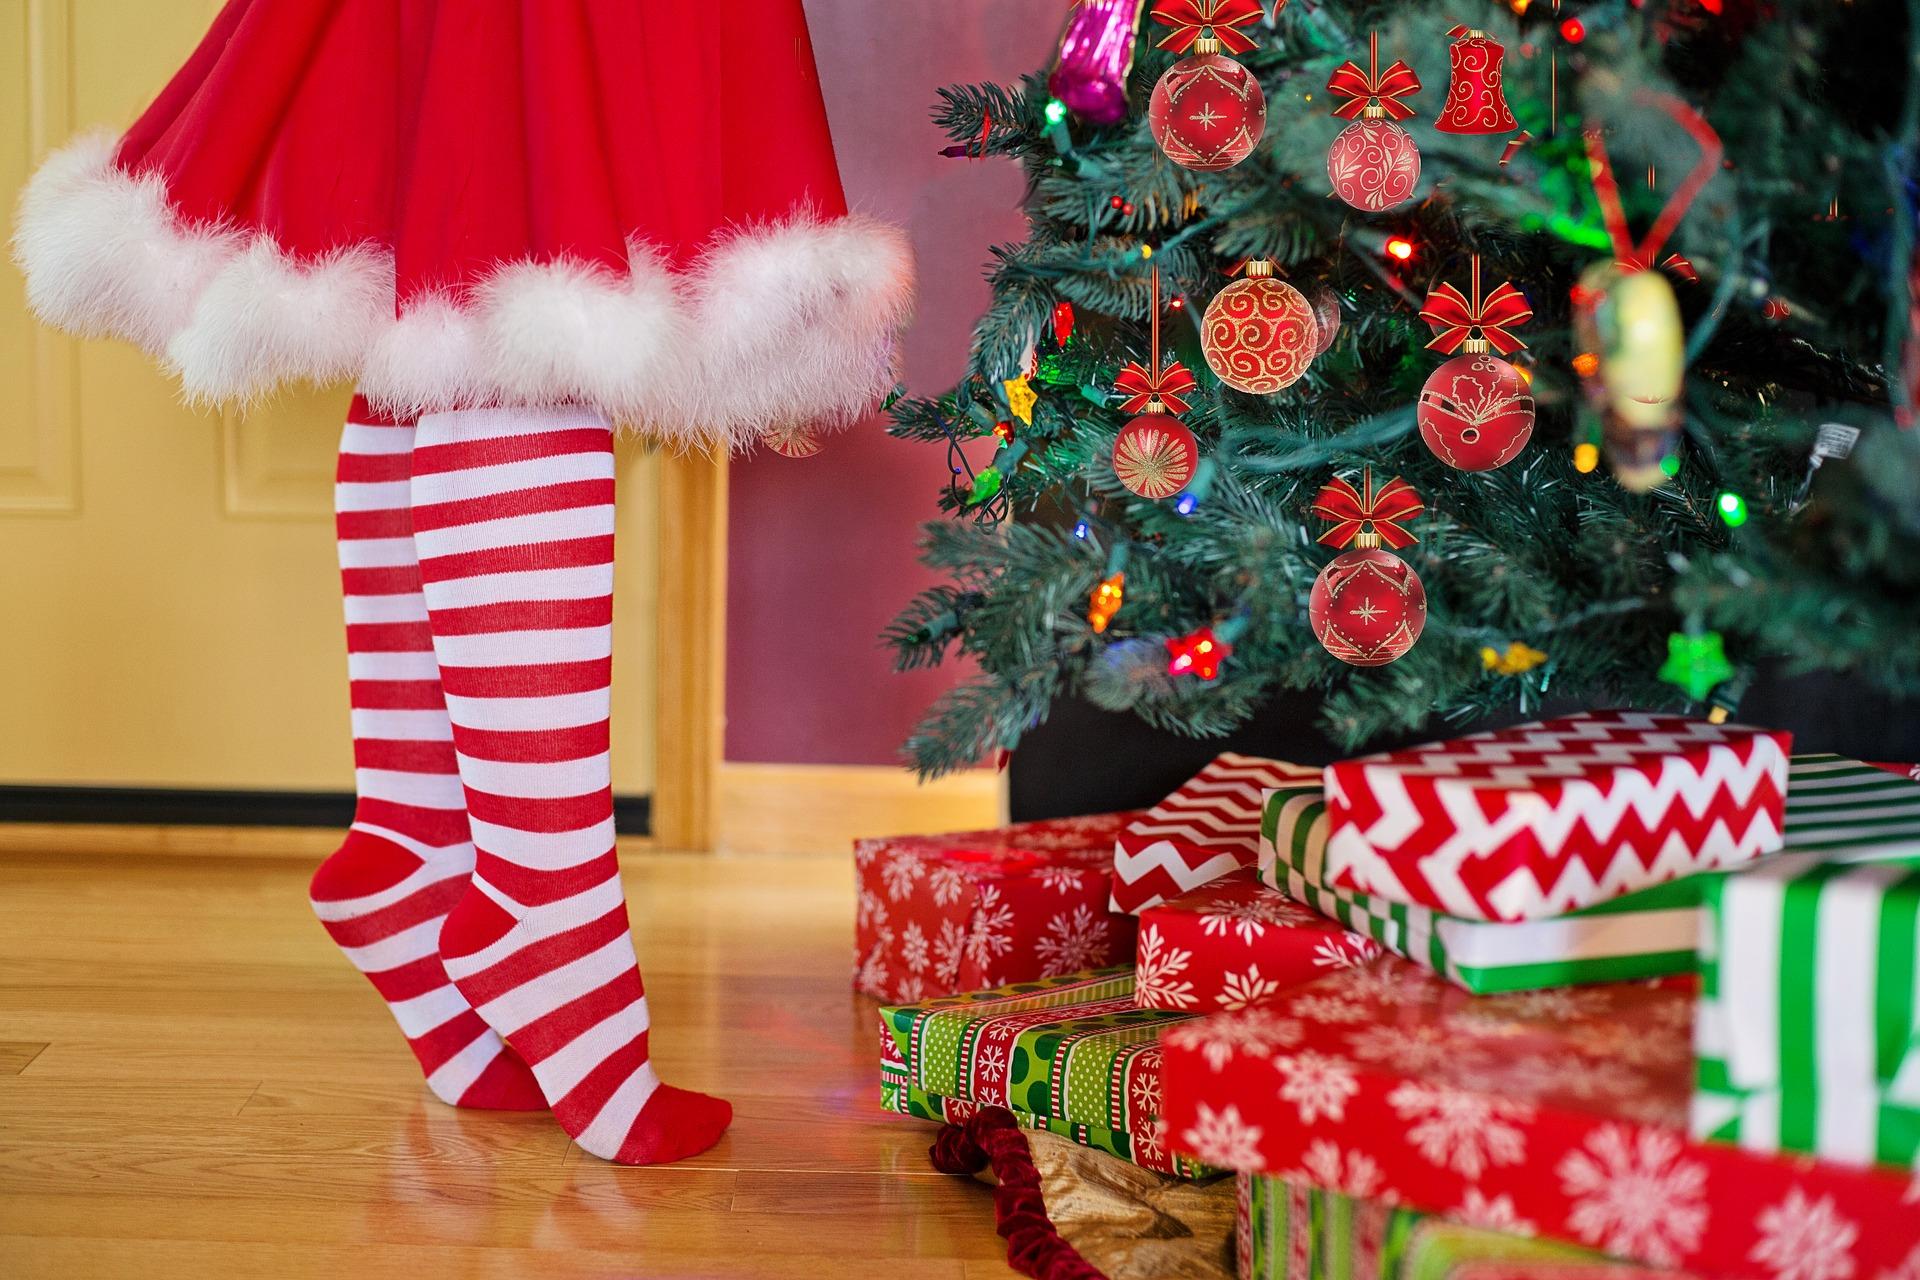 decorating-christmas-tree-2999722_1920